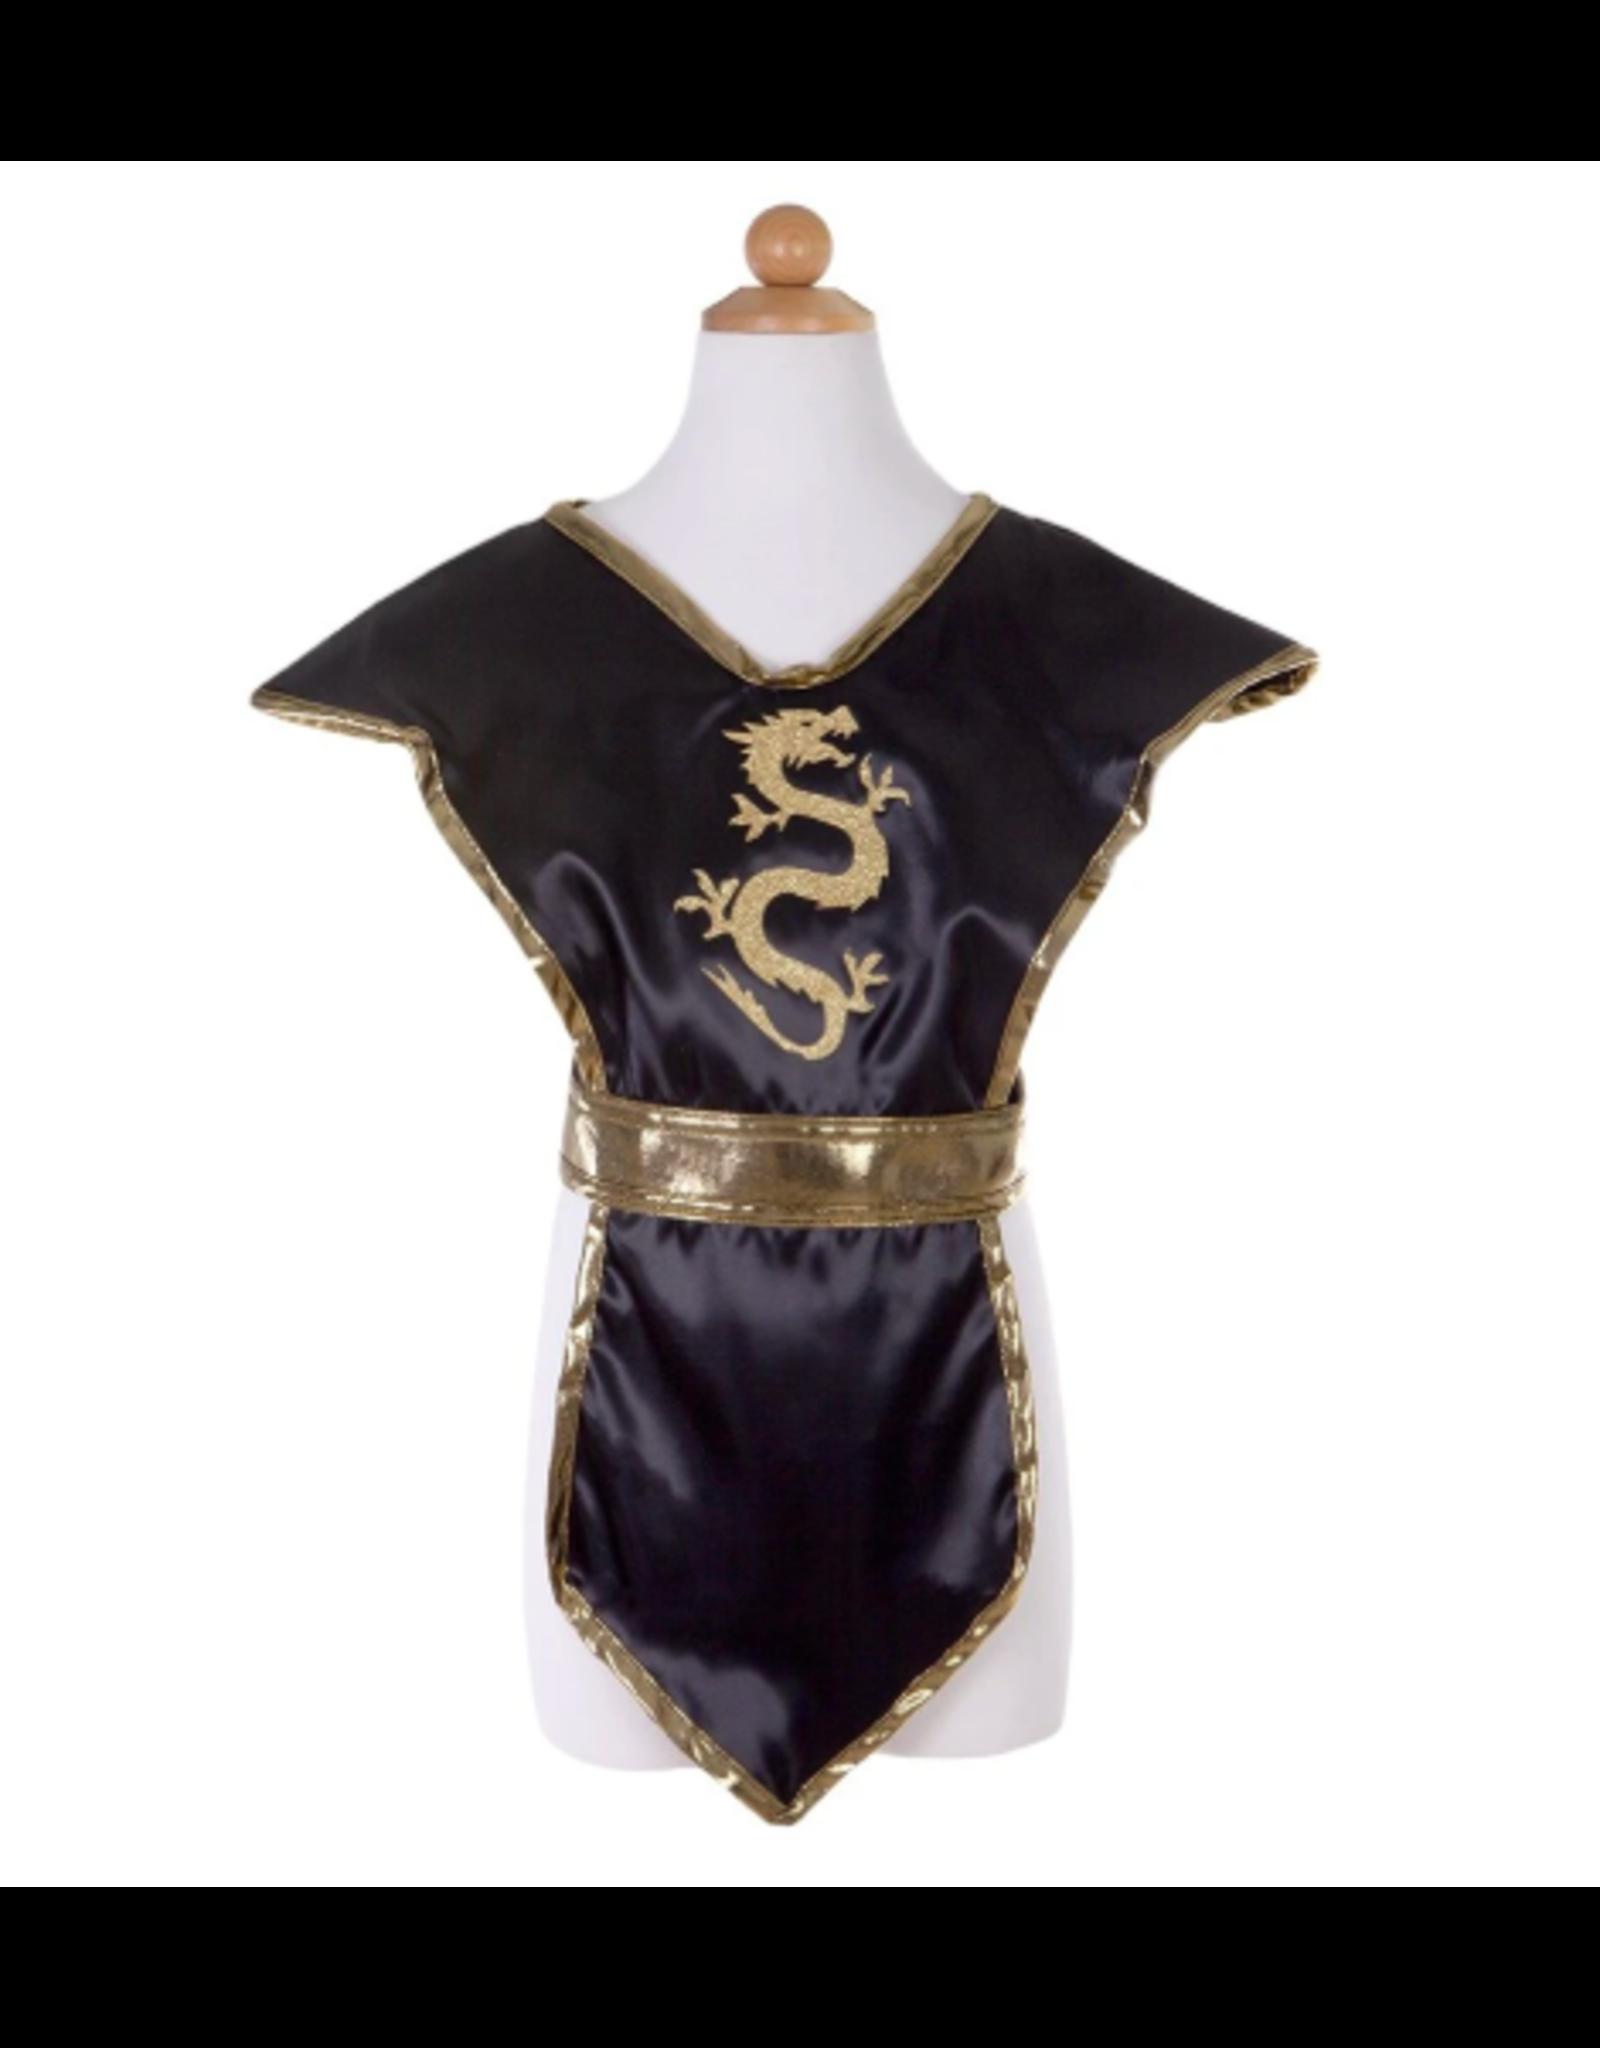 Great Pretenders Ninja Tunic Black & Gold, Size 5-6